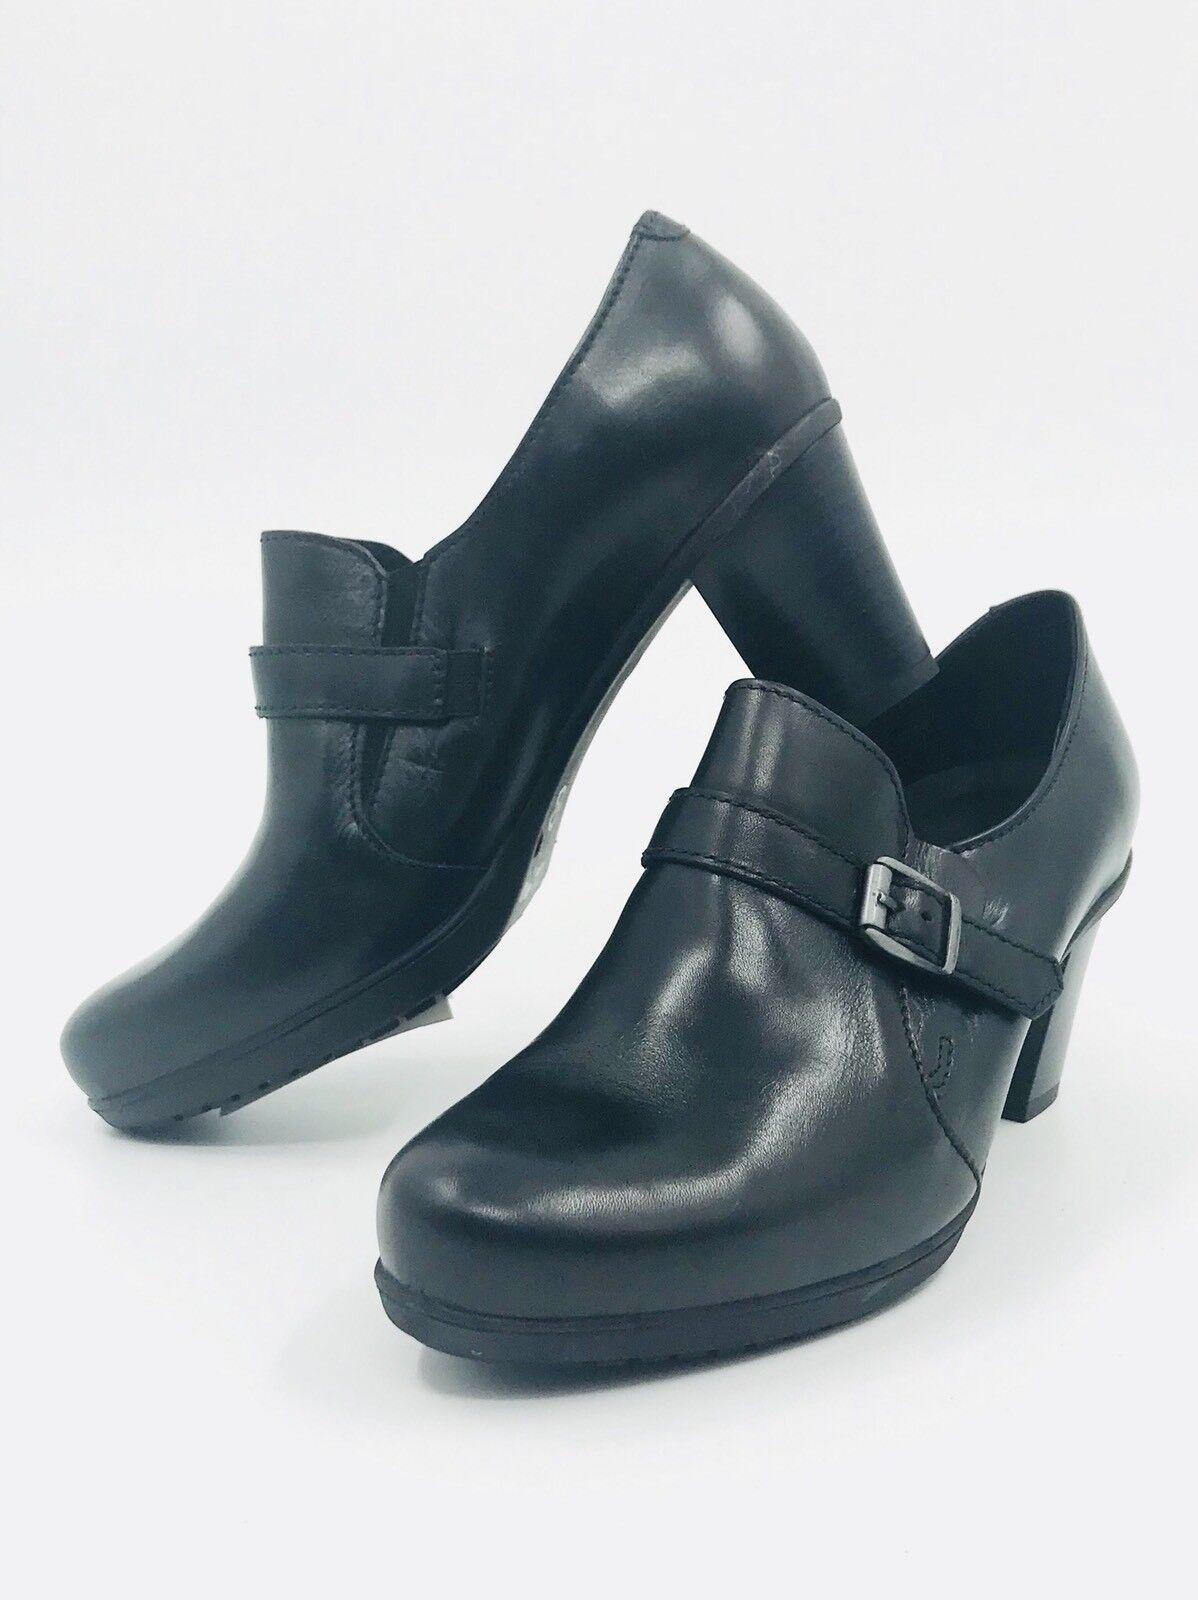 Spring Step Wouomo Idir Slip On Loafer Clog nero Dimensione 38   7.5-8